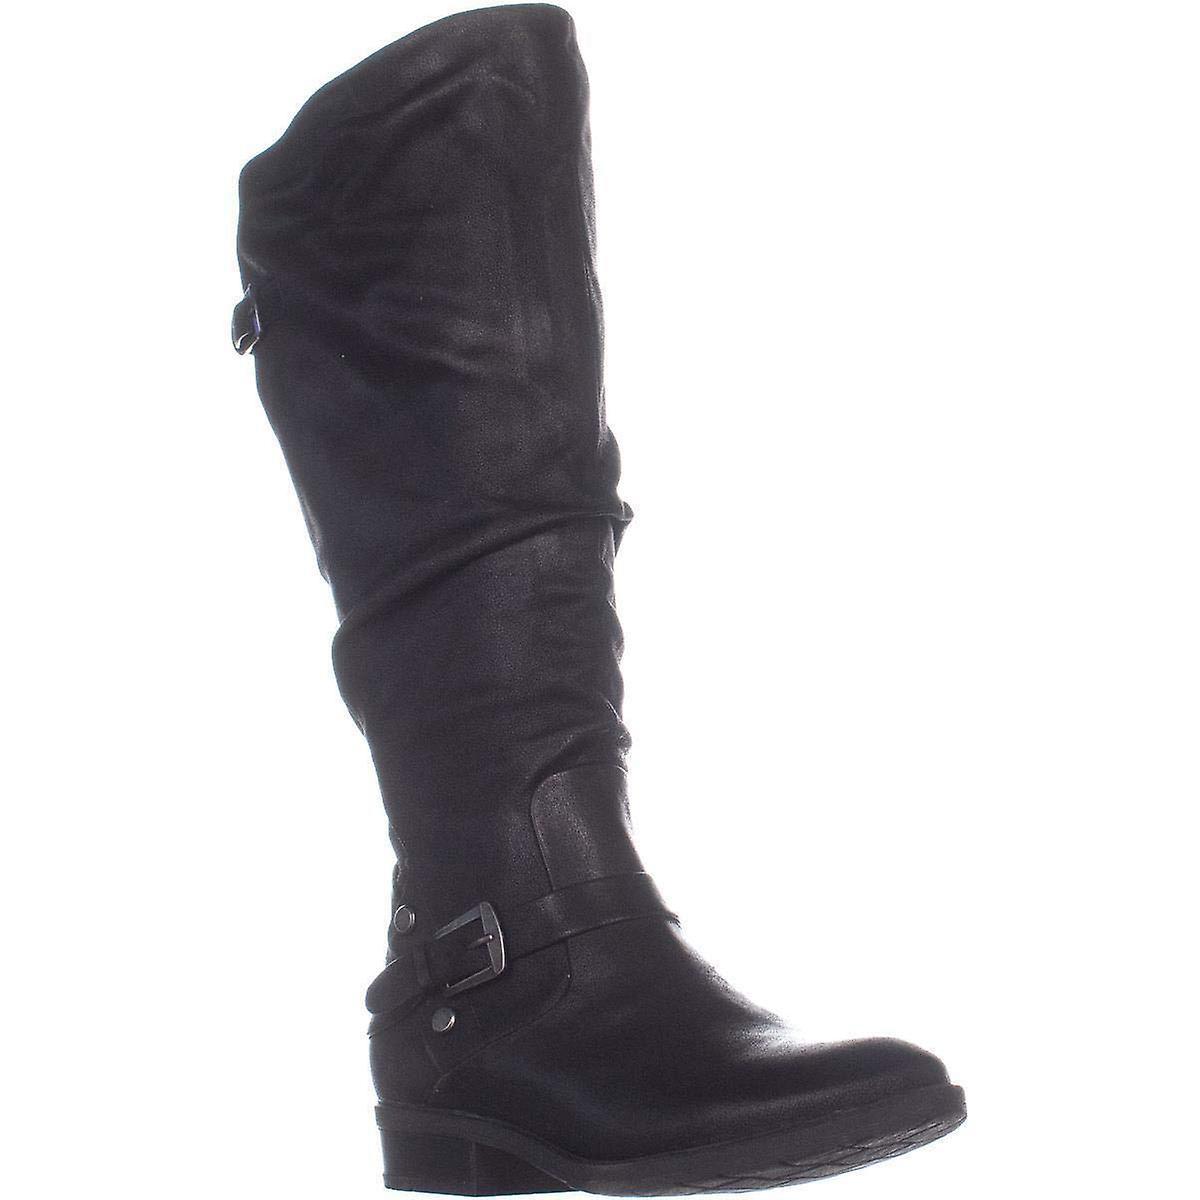 Pièges À Nus Womens Yanessa2 Fermé Toe Knee High Fashion Bottes